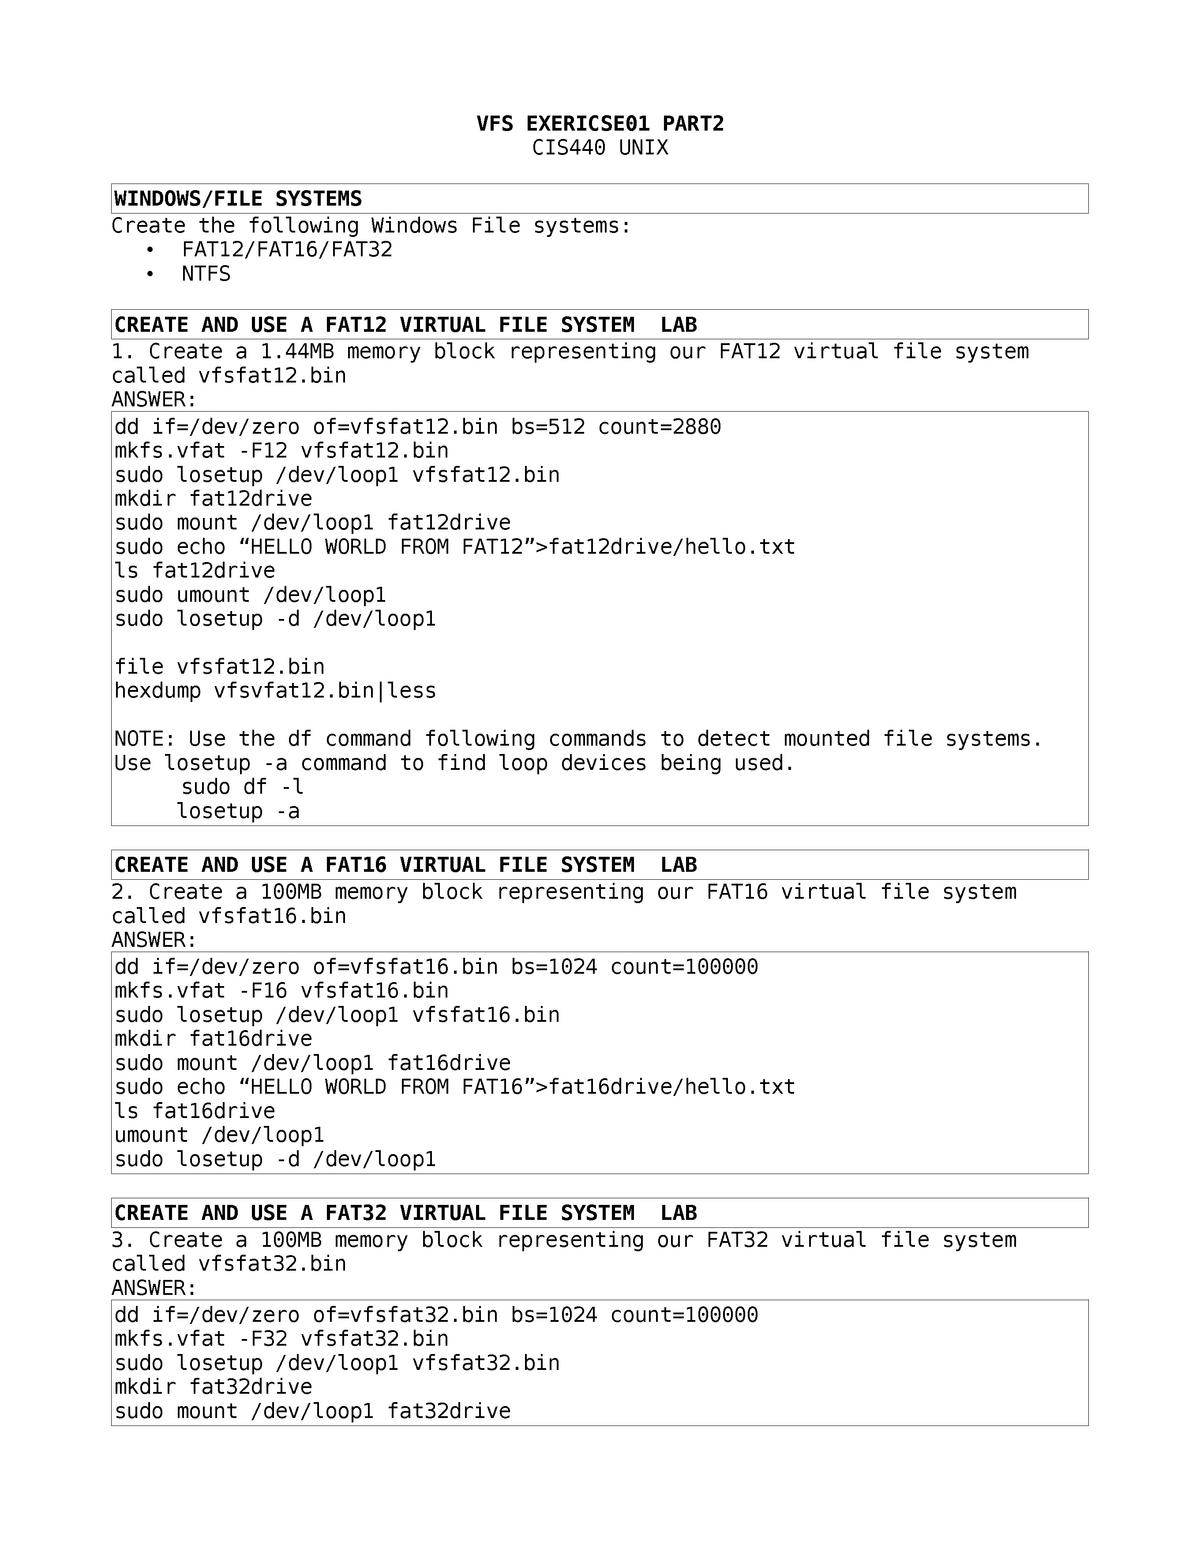 VFSExercise 02 - virtual file system management - CIS 440